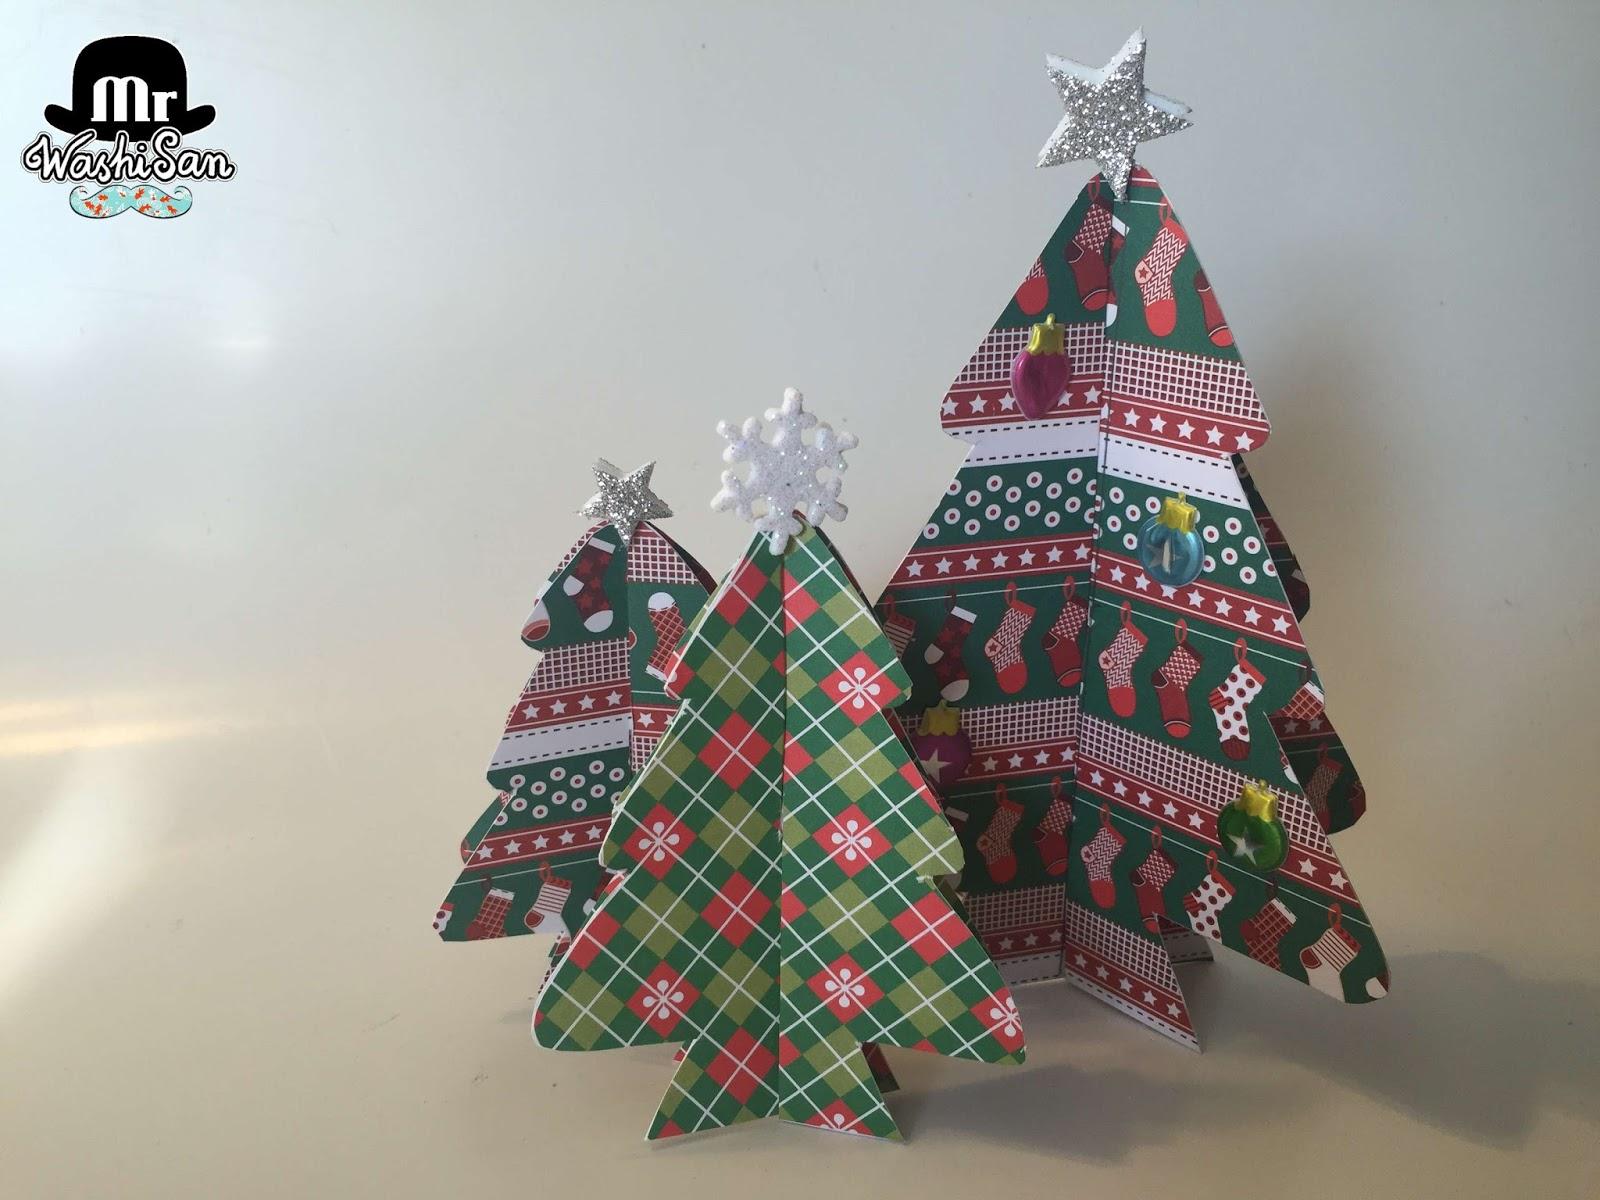 Mr washisan rboles de navidad de papel decorado - Ver arboles de navidad decorados ...